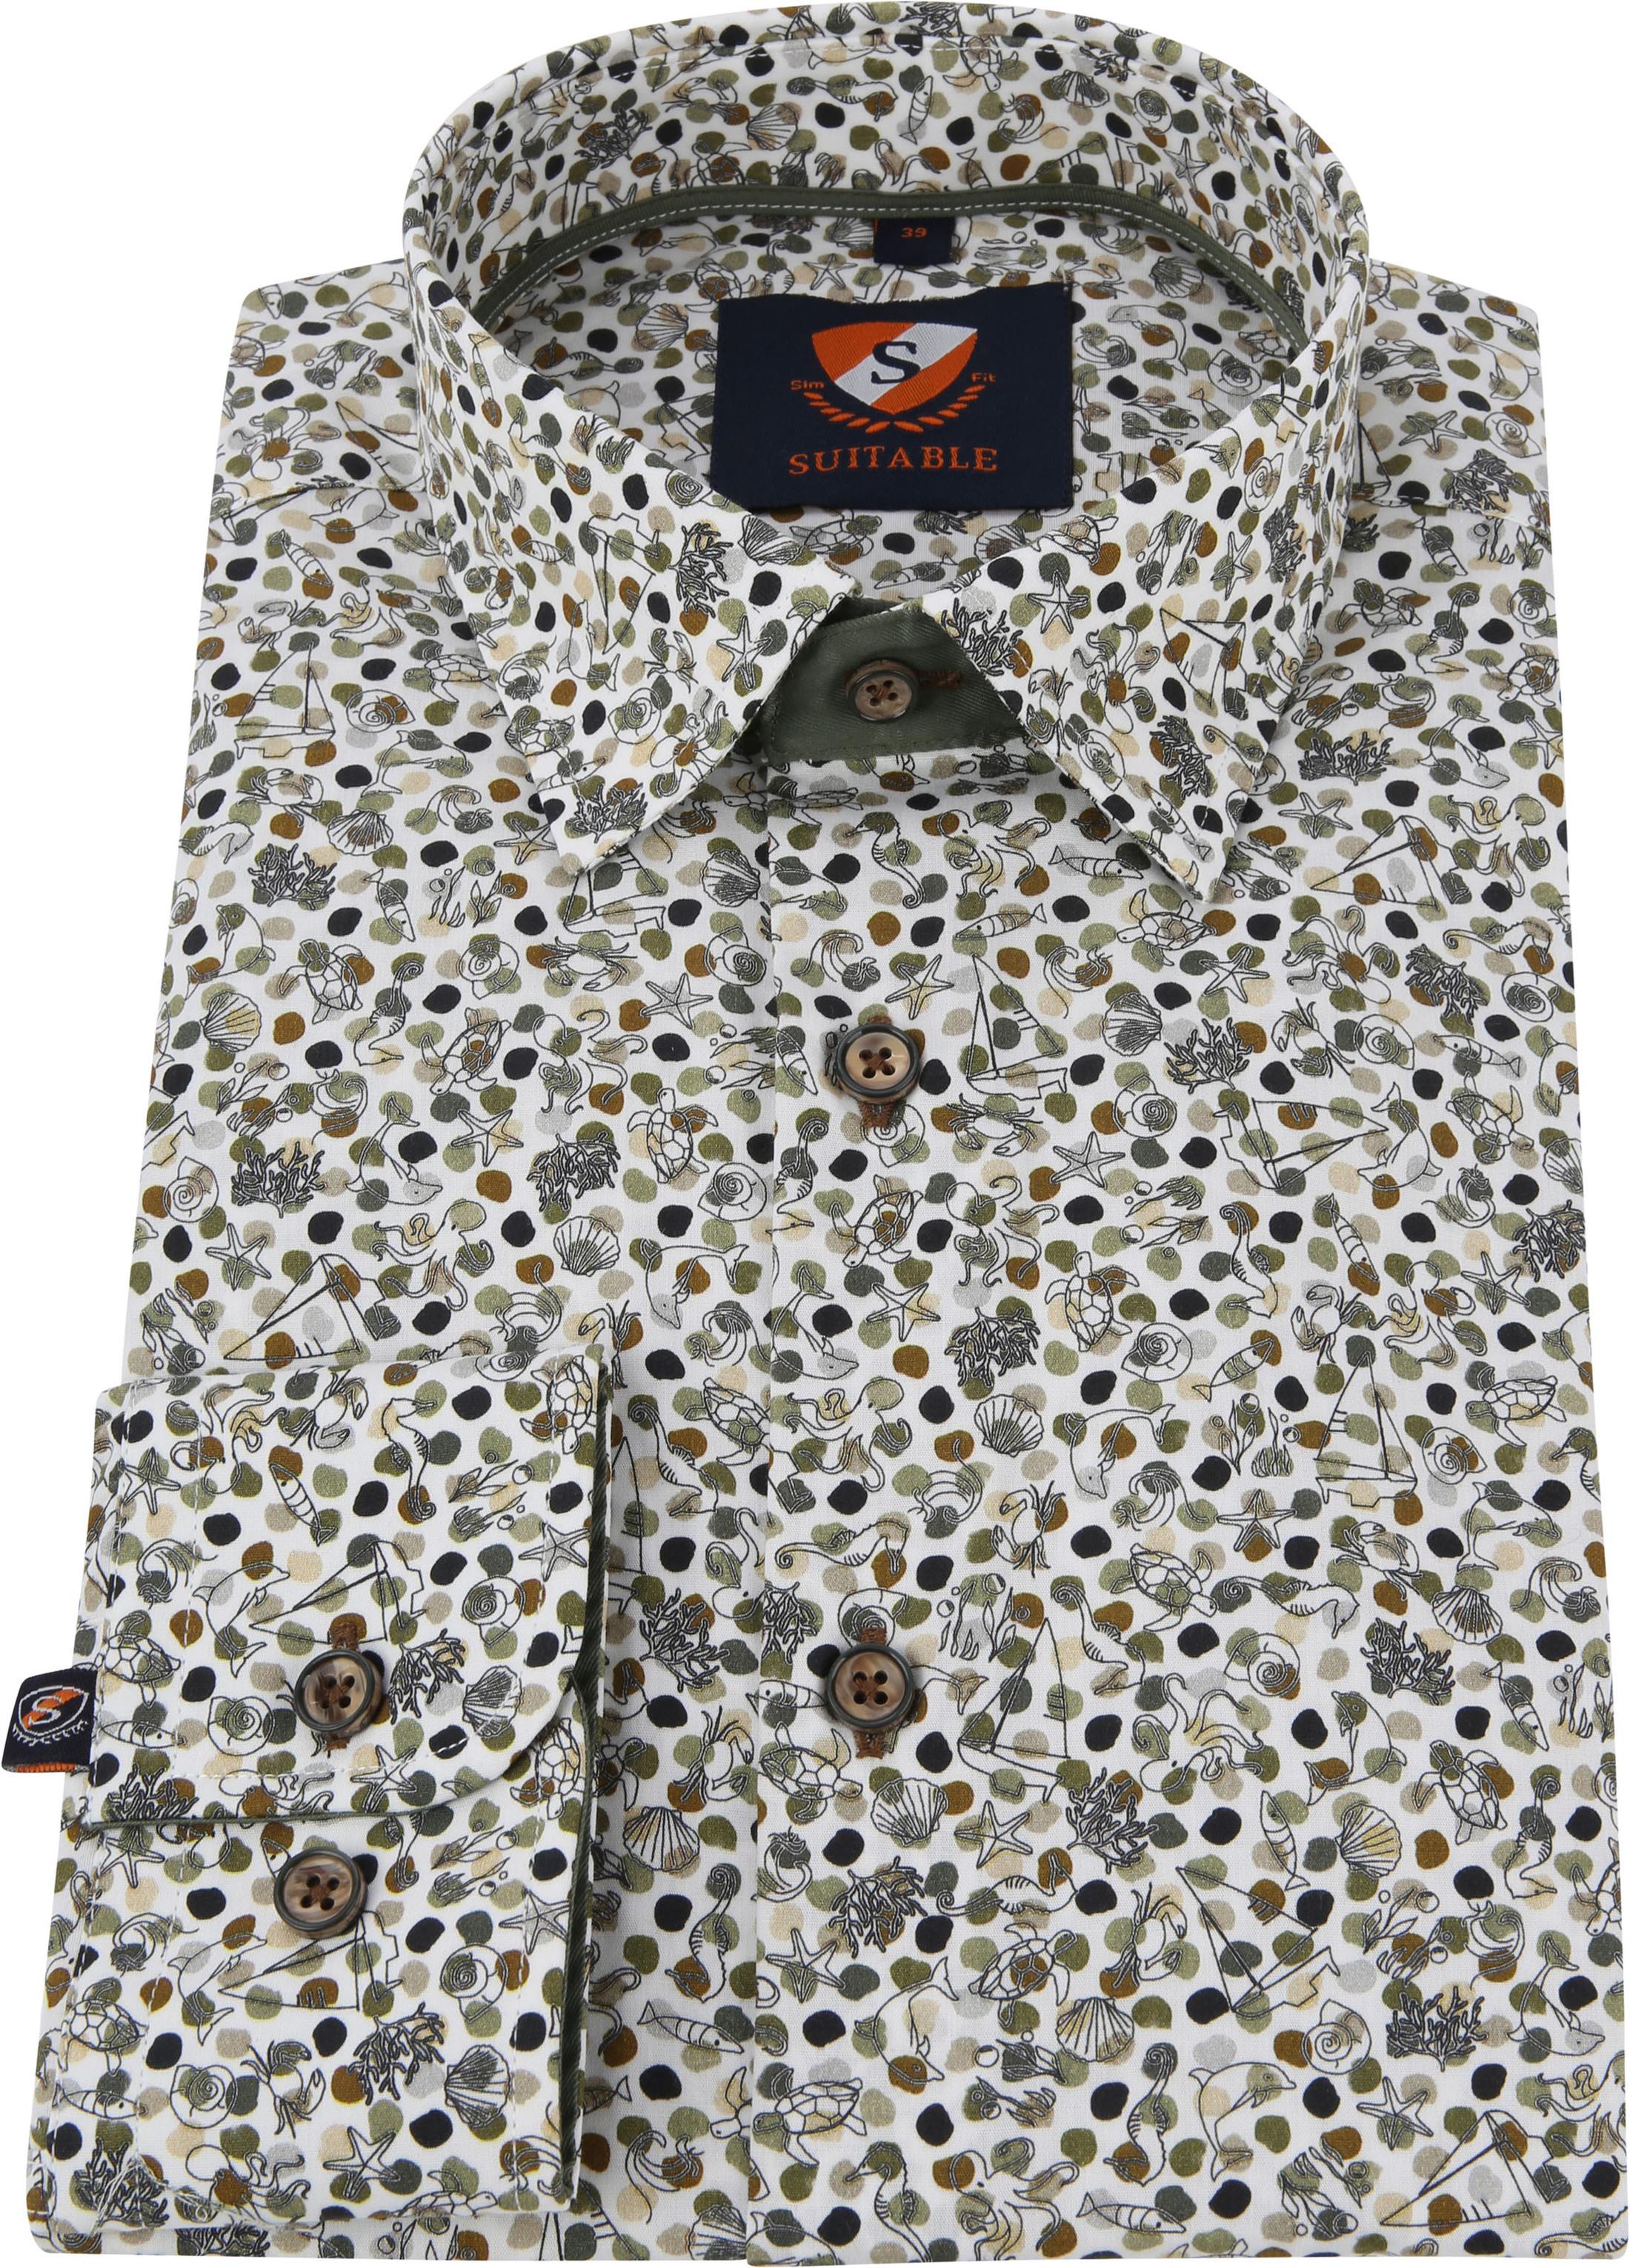 Suitable Shirt HBD Sea Print Green foto 3